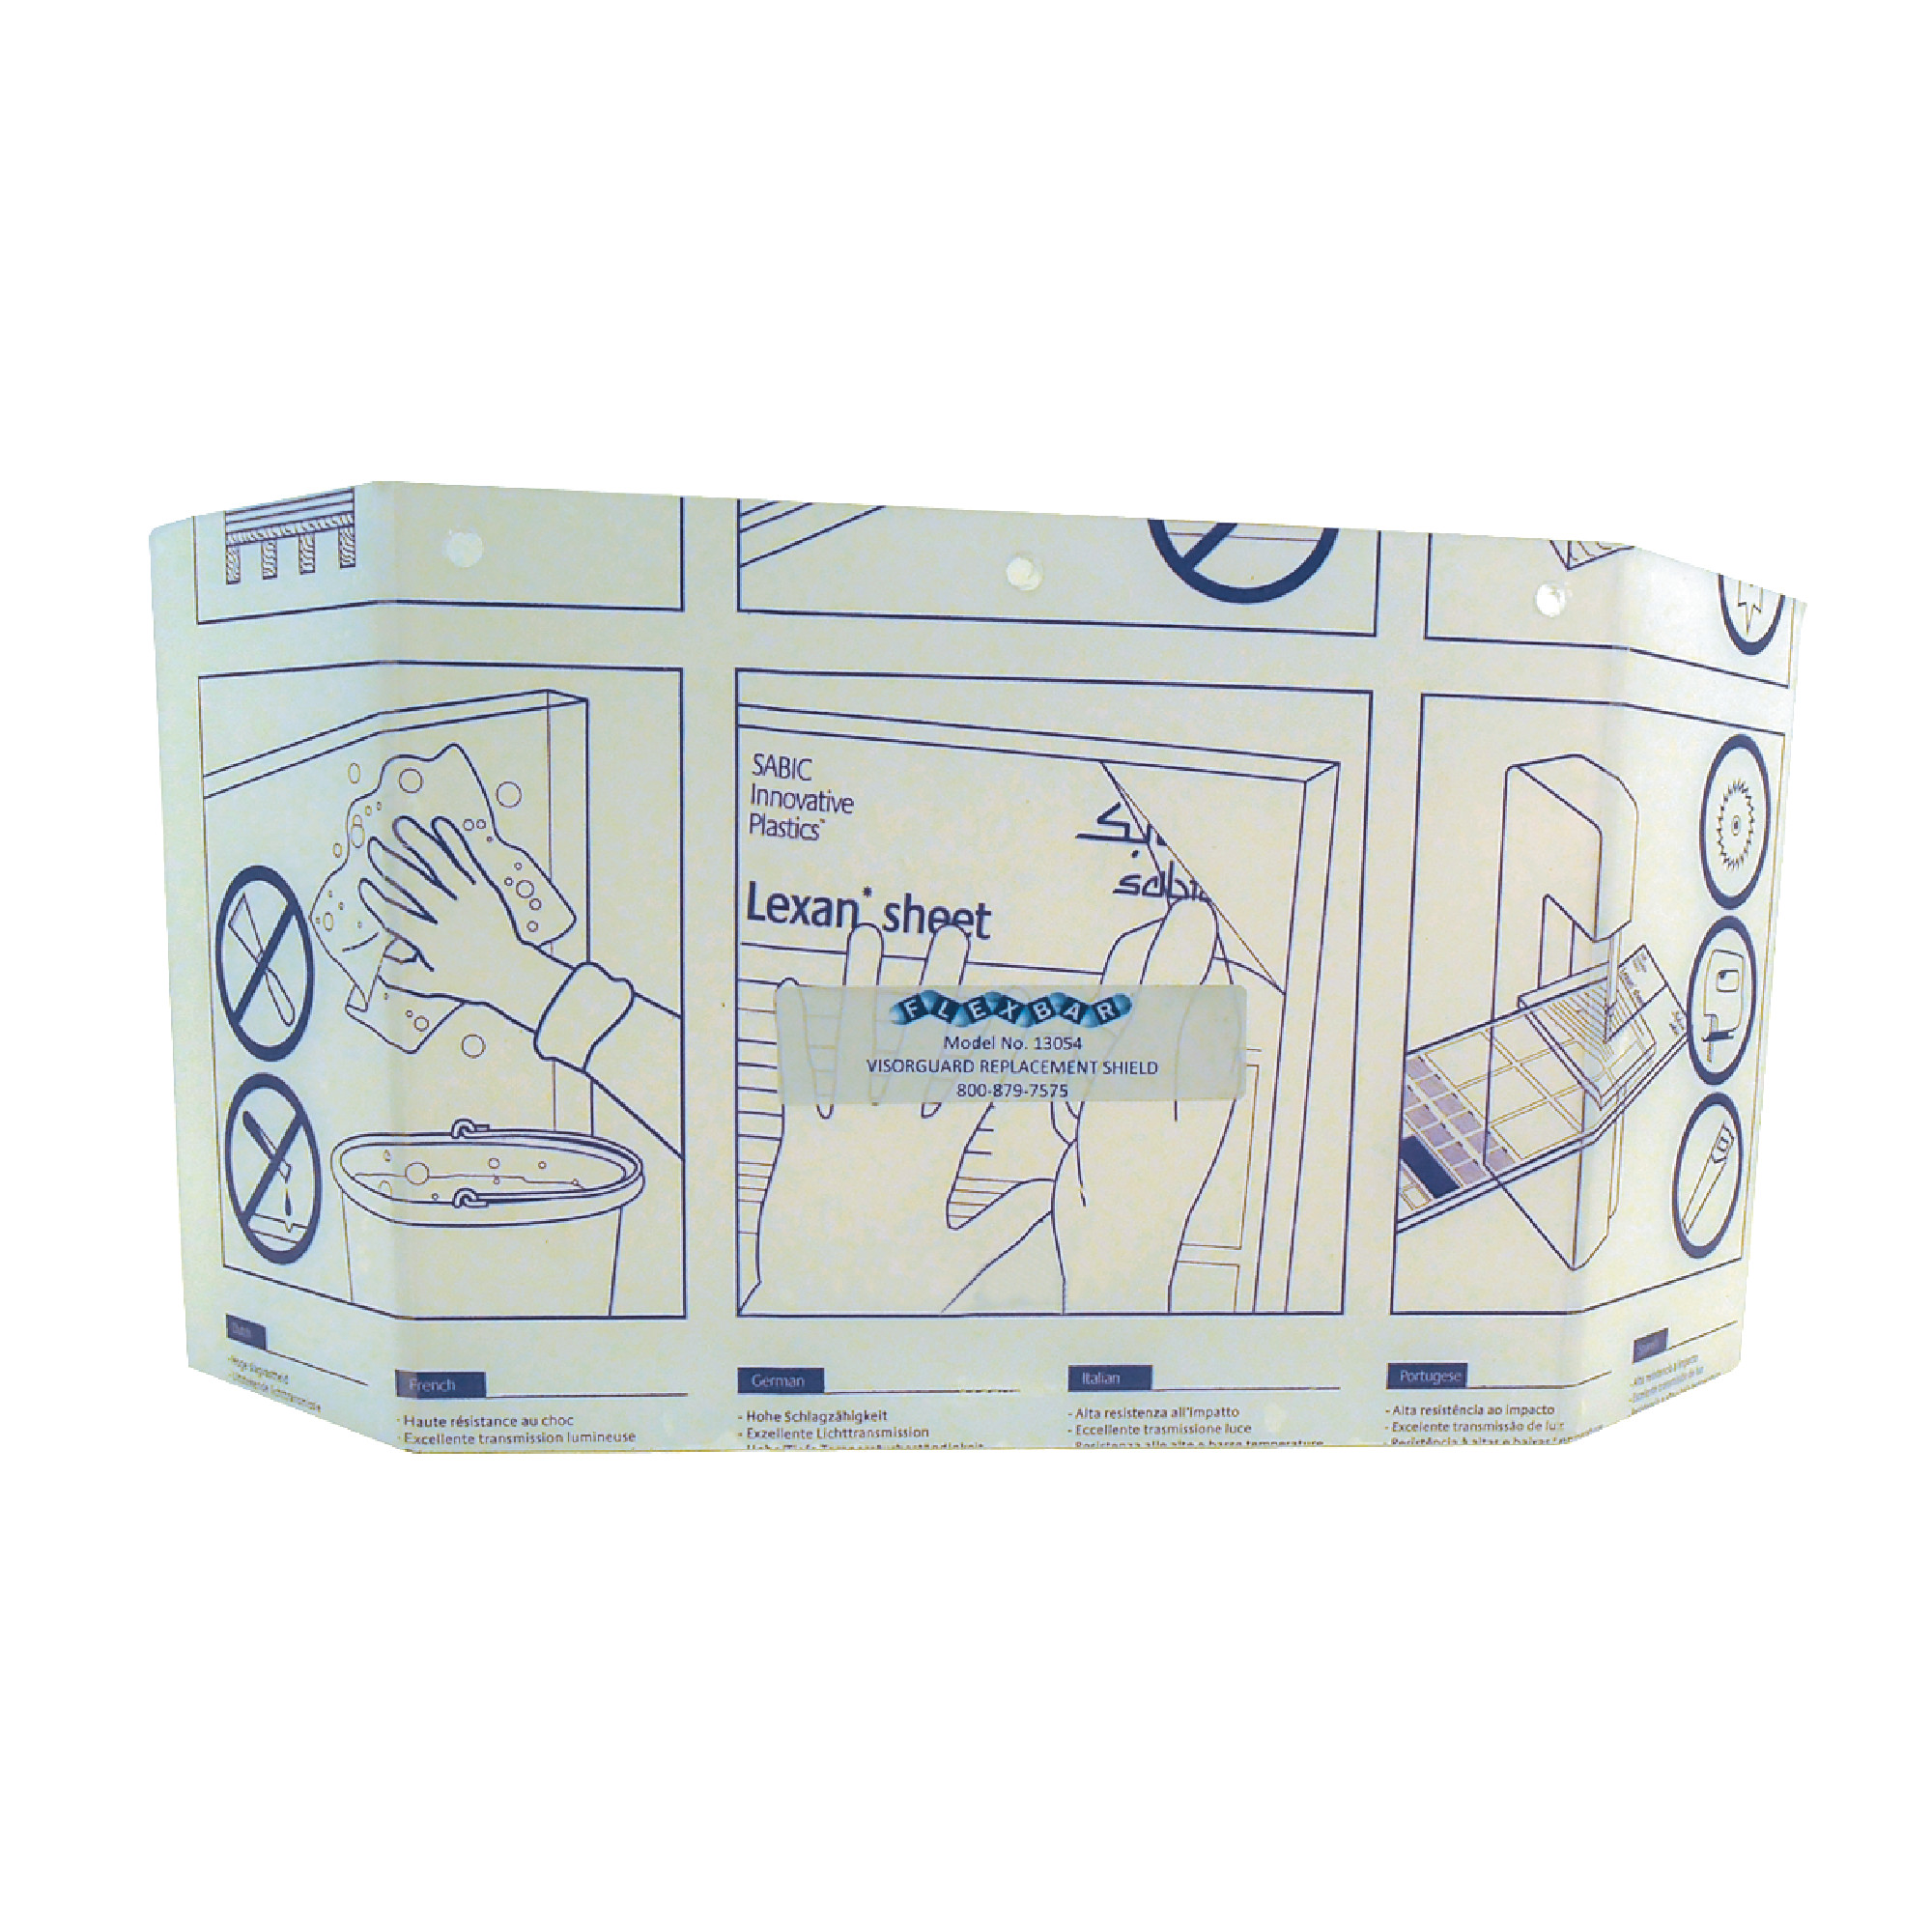 Visorguard™ Safety Shield